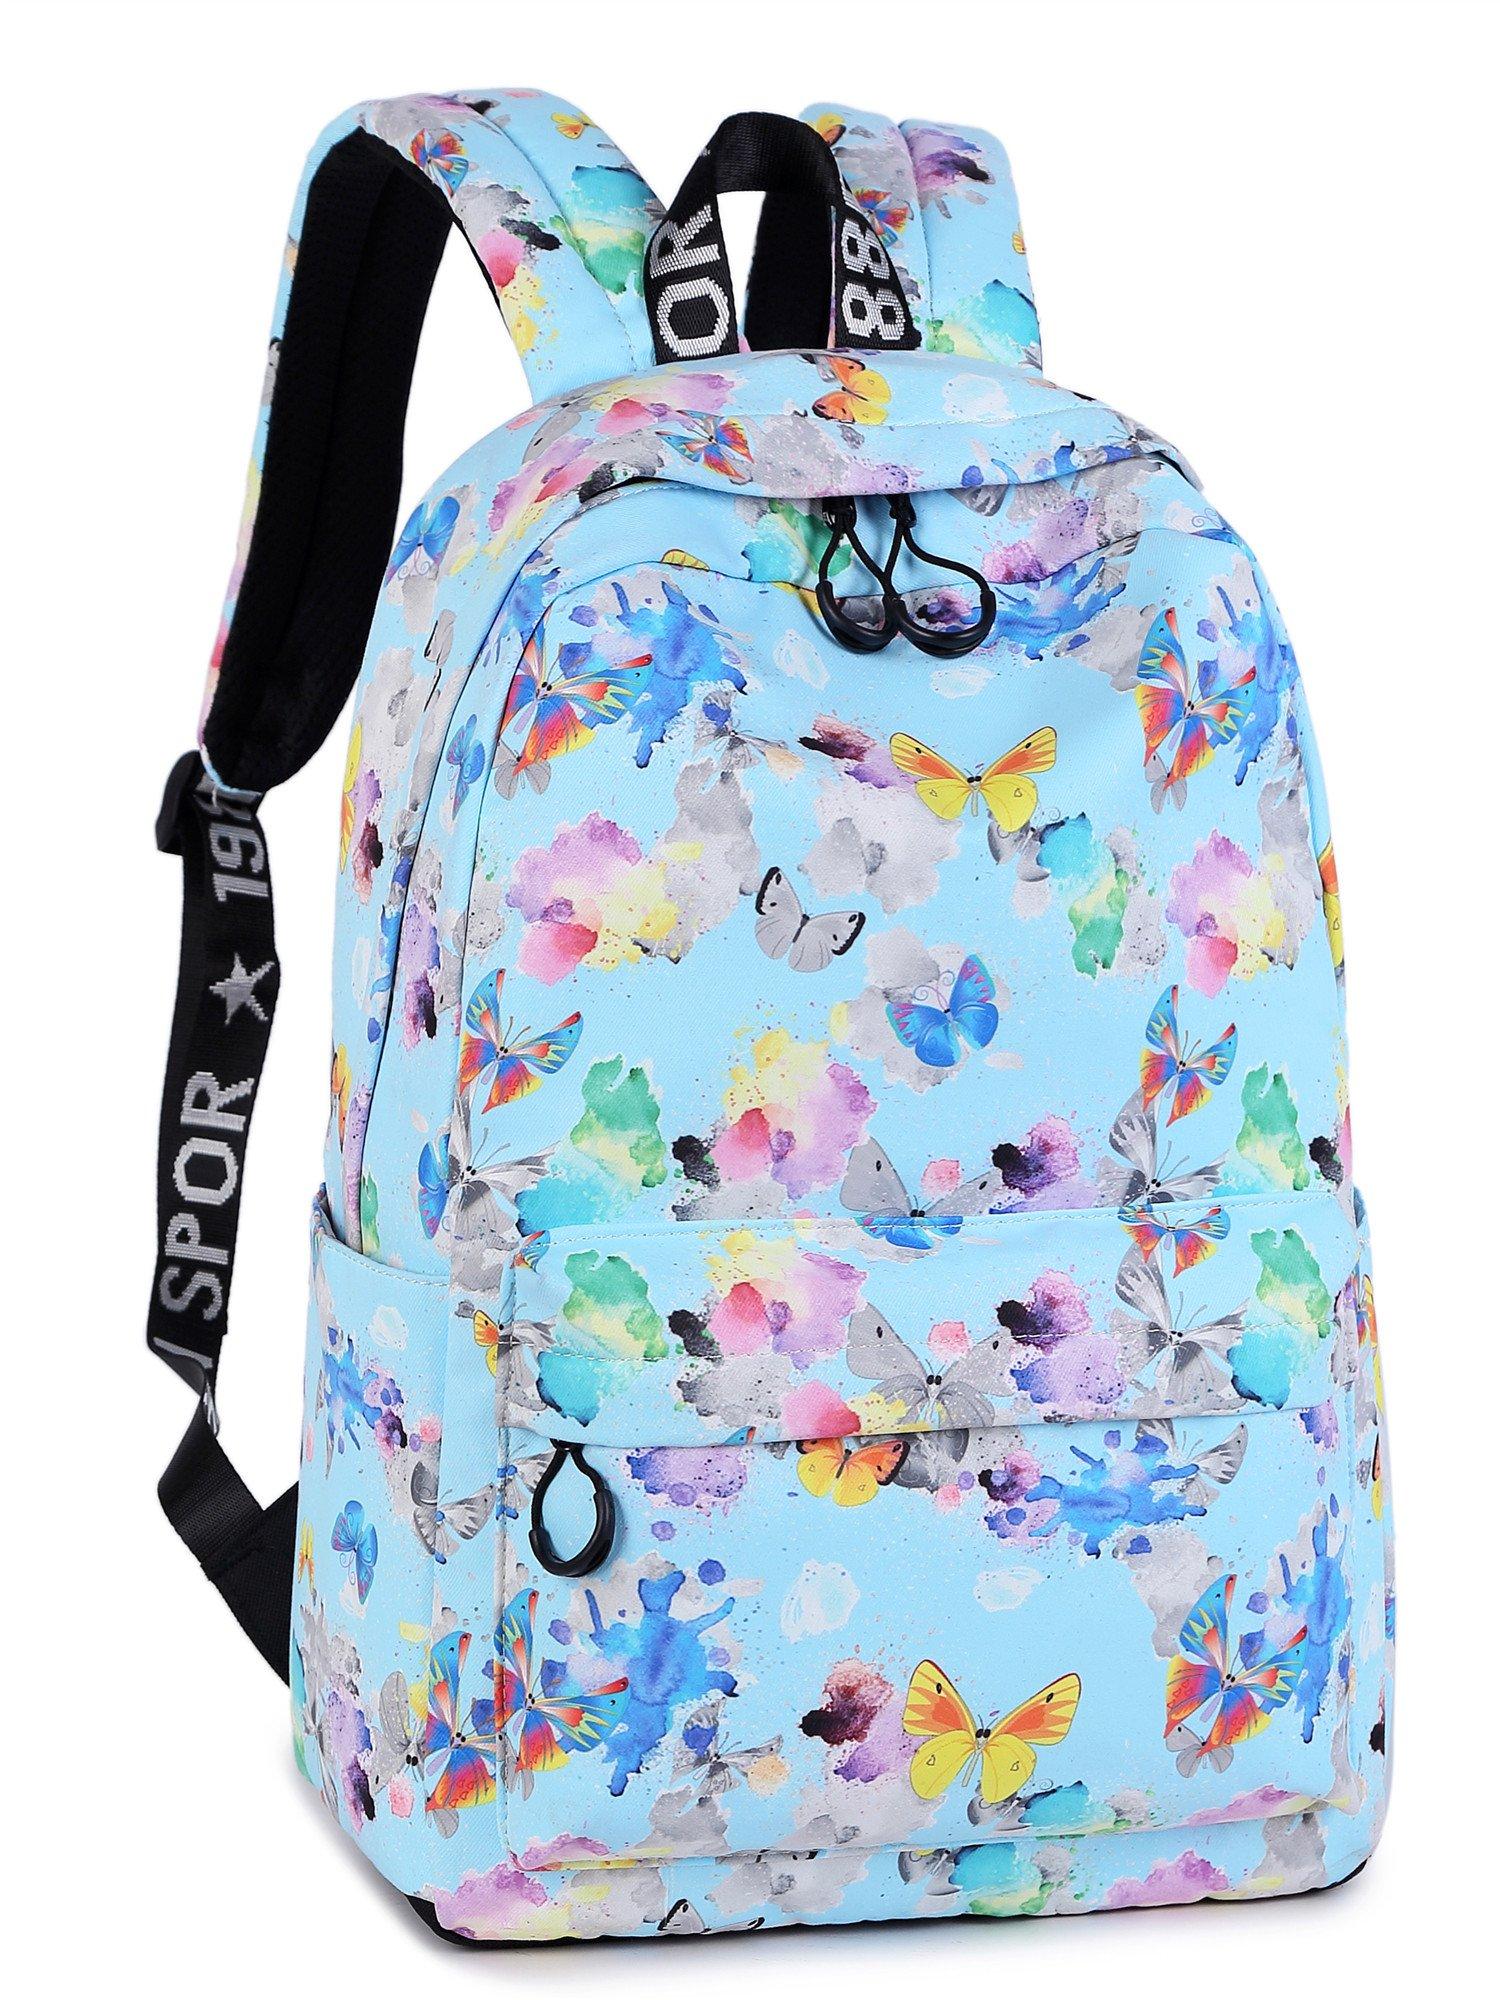 Leaper Butterfly Backpack School Backpack Girls Travel Satchel Daypack Blue BF